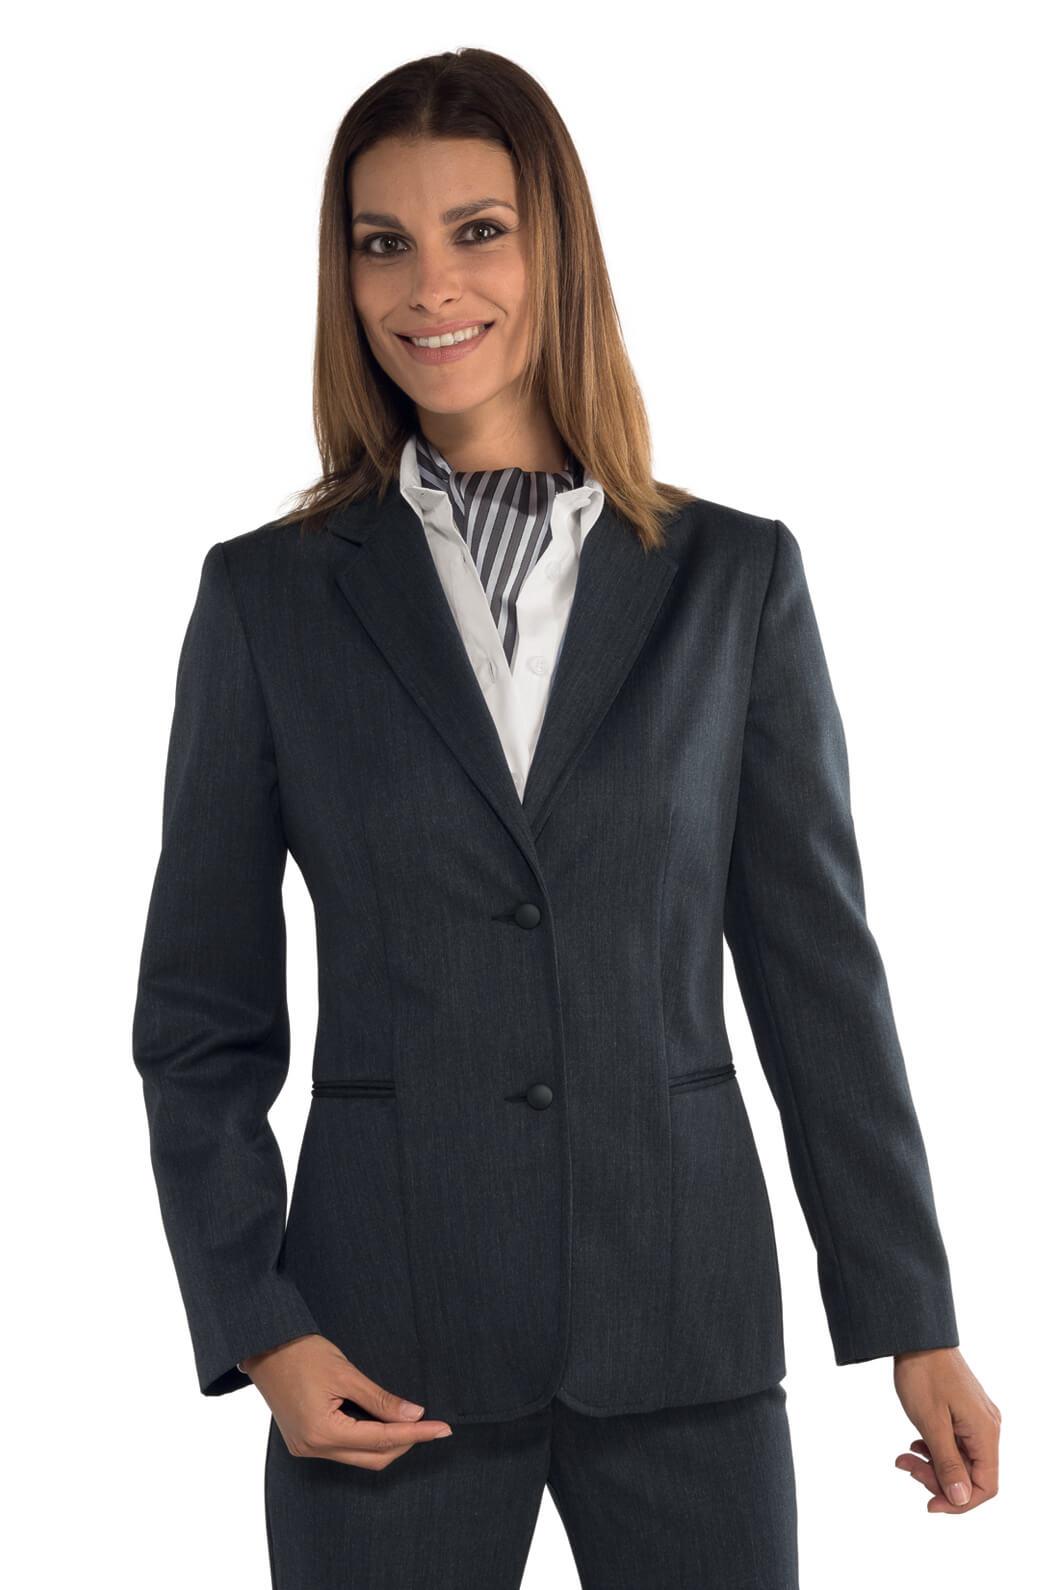 veste femme mi saison liberty anthracite hotellerie tailleur uniforme femme. Black Bedroom Furniture Sets. Home Design Ideas